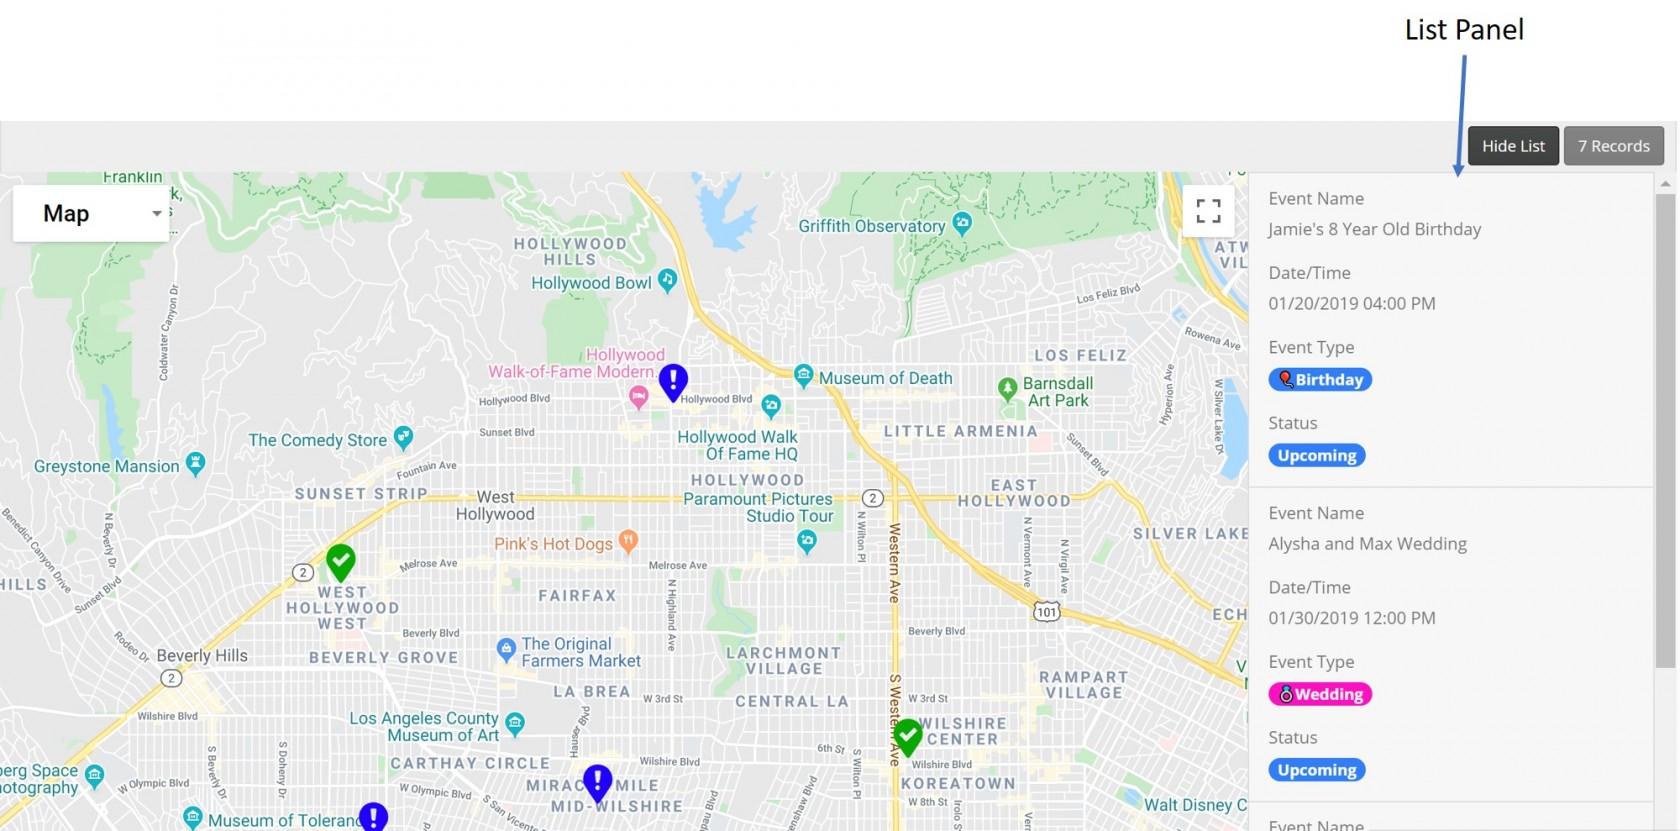 Map-List-Panel.jpg